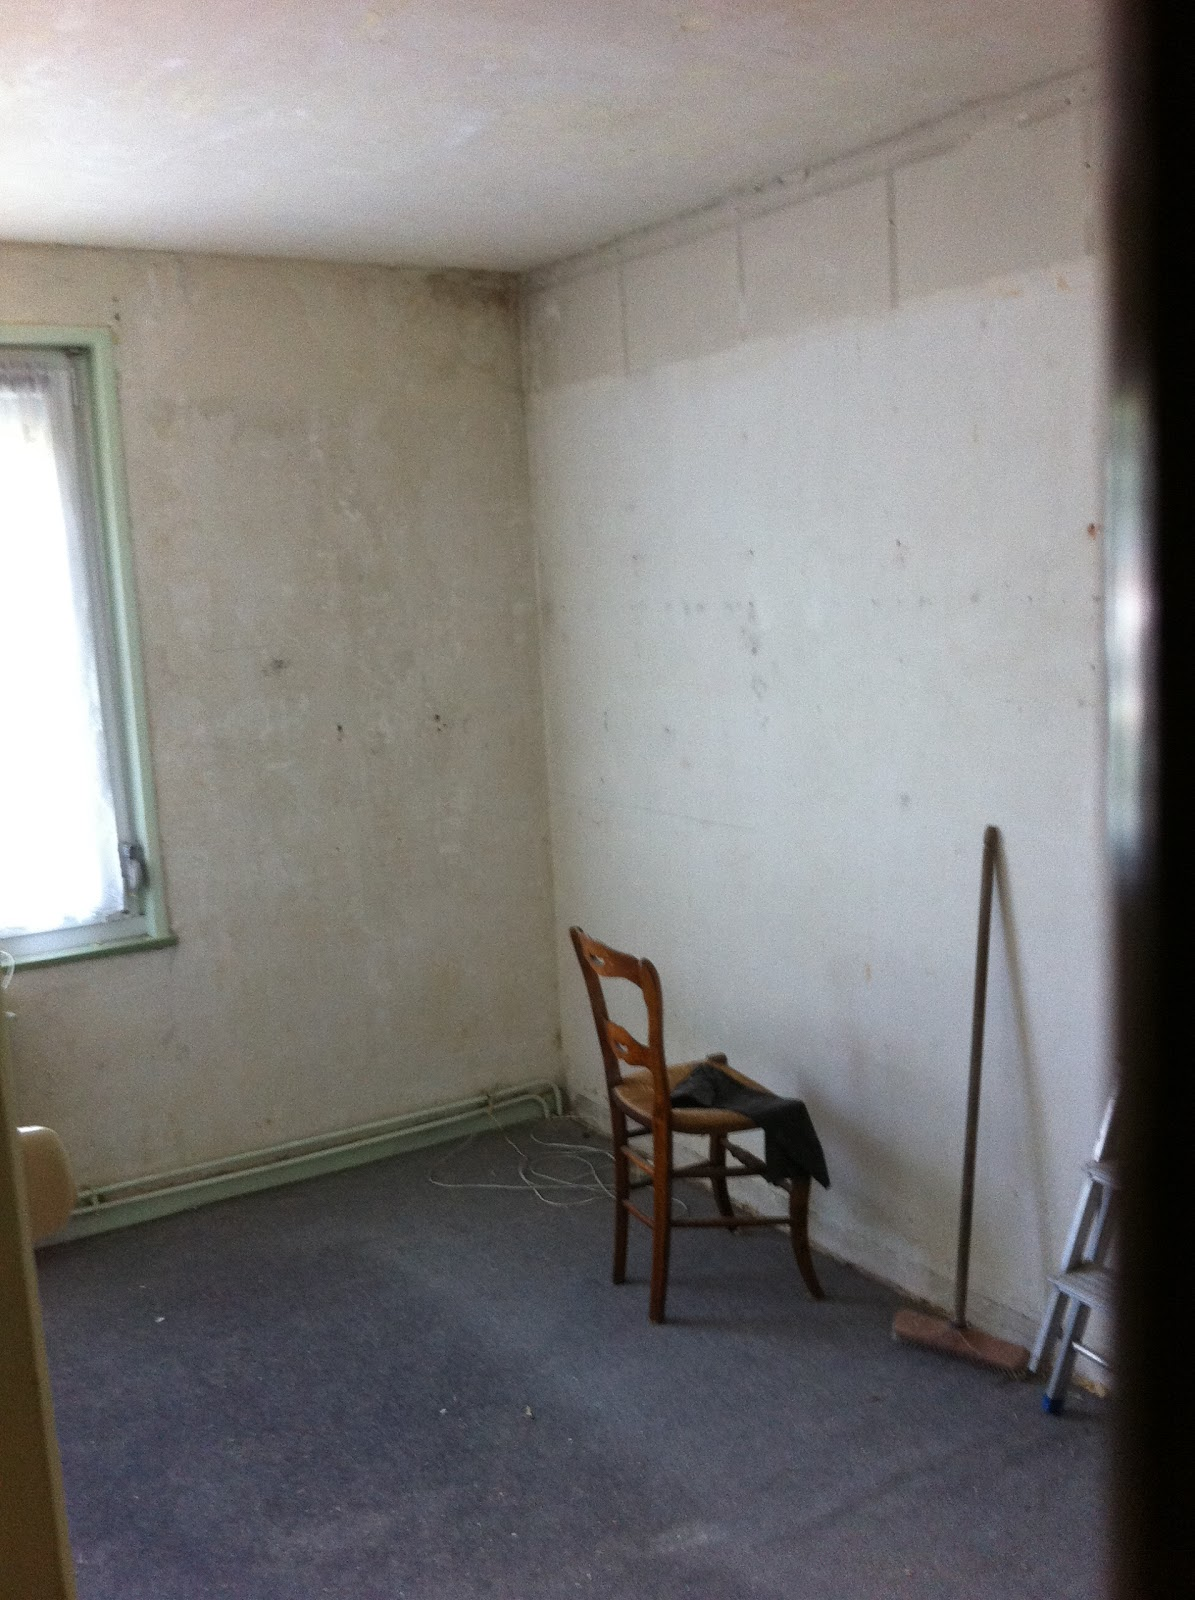 detapisser tapisserie dja rpondu mais je tenvois une photo with detapisser tapisserie. Black Bedroom Furniture Sets. Home Design Ideas